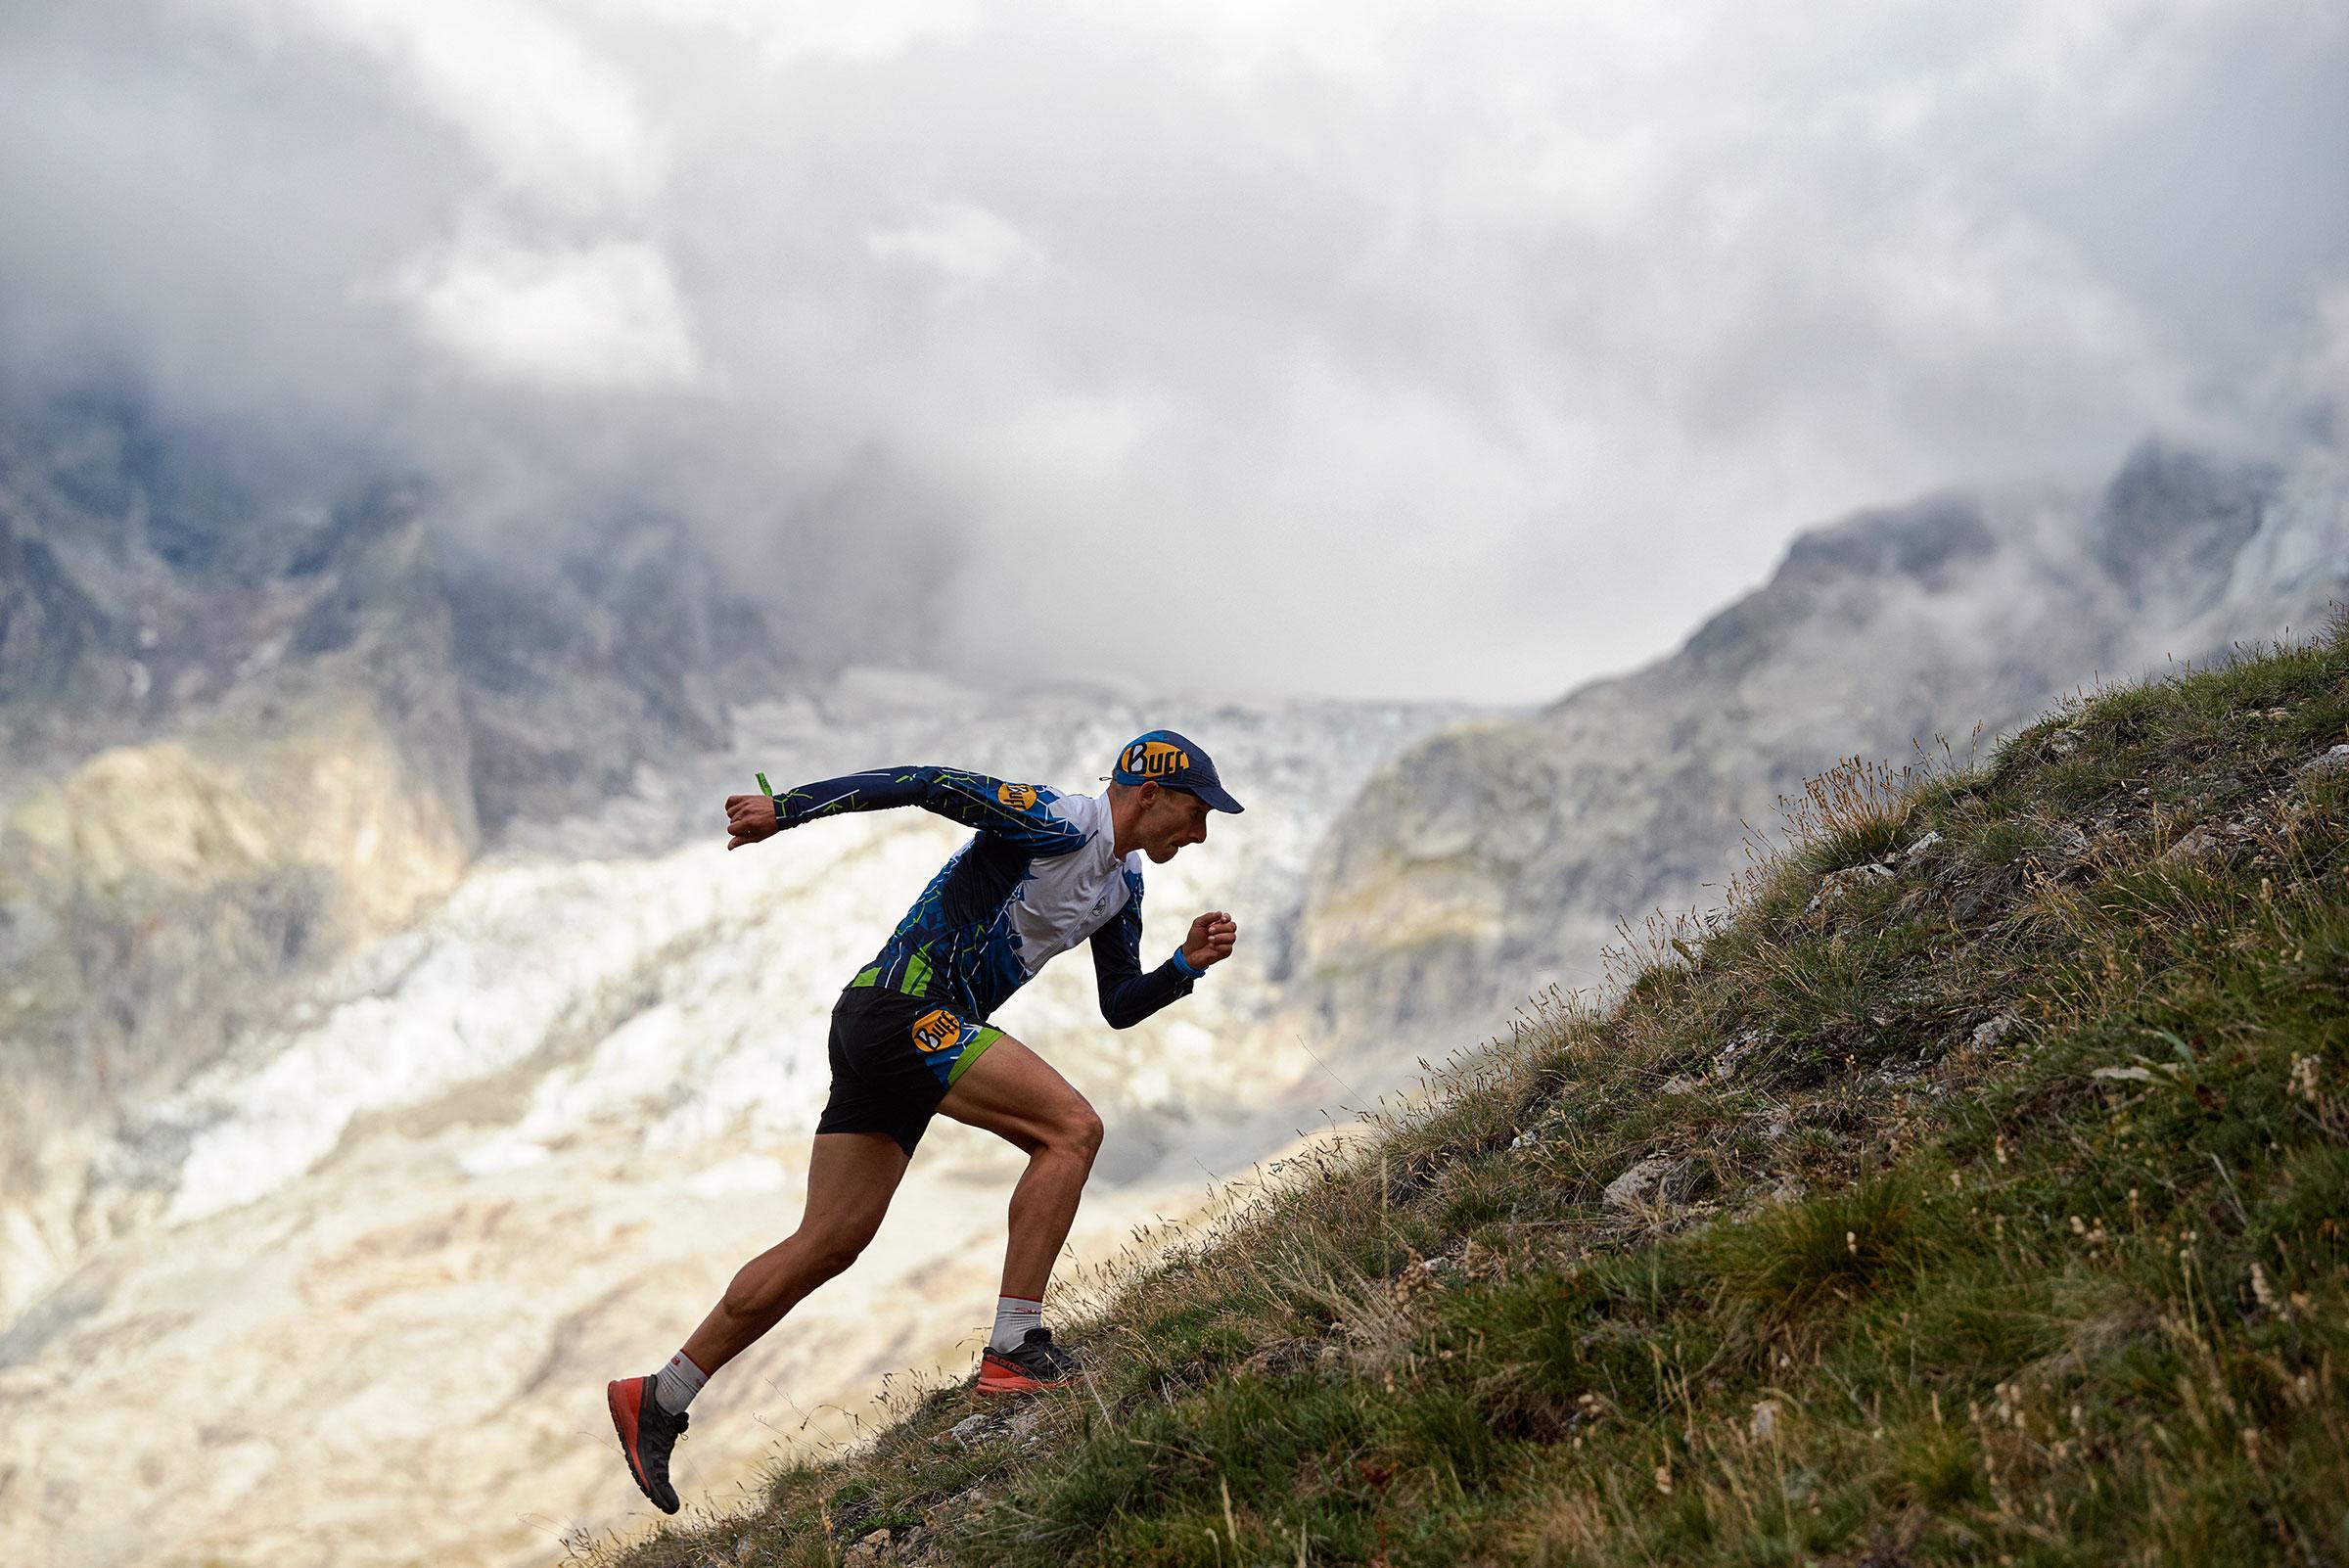 Marcin Świerc / Buff Pro Team / Aosta Valley 2017